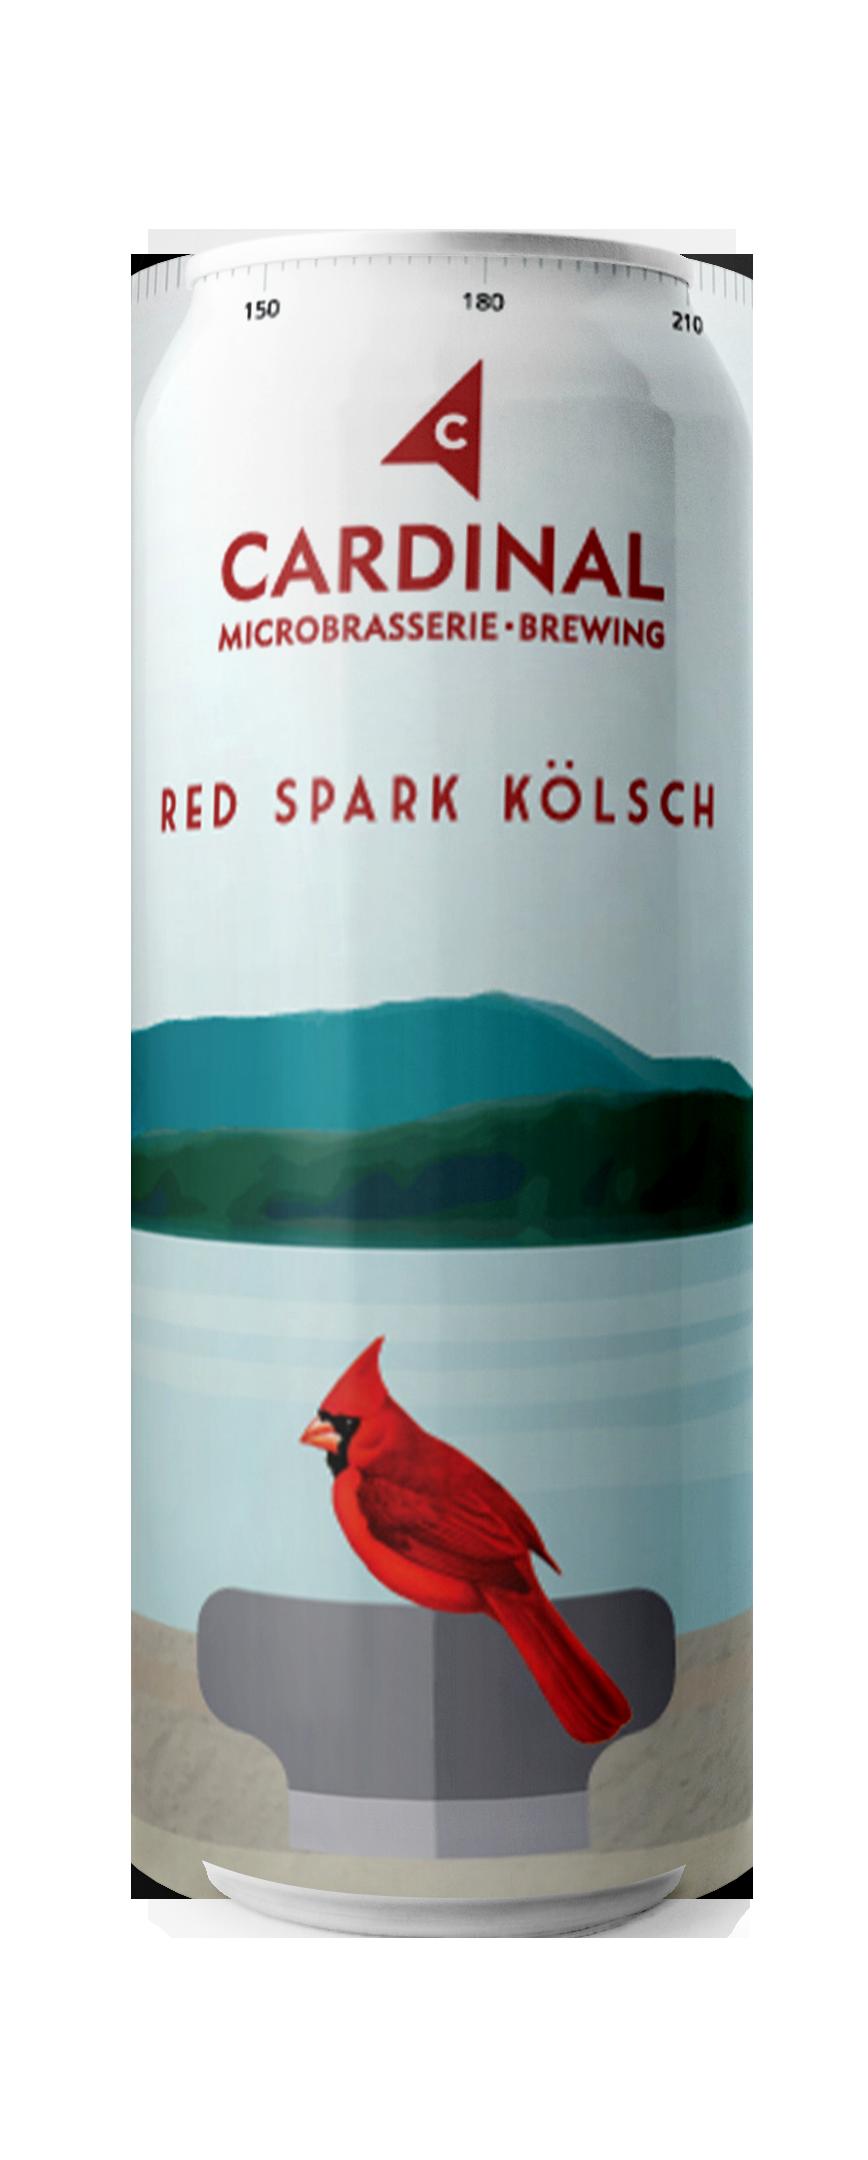 Red Spark Kölsch